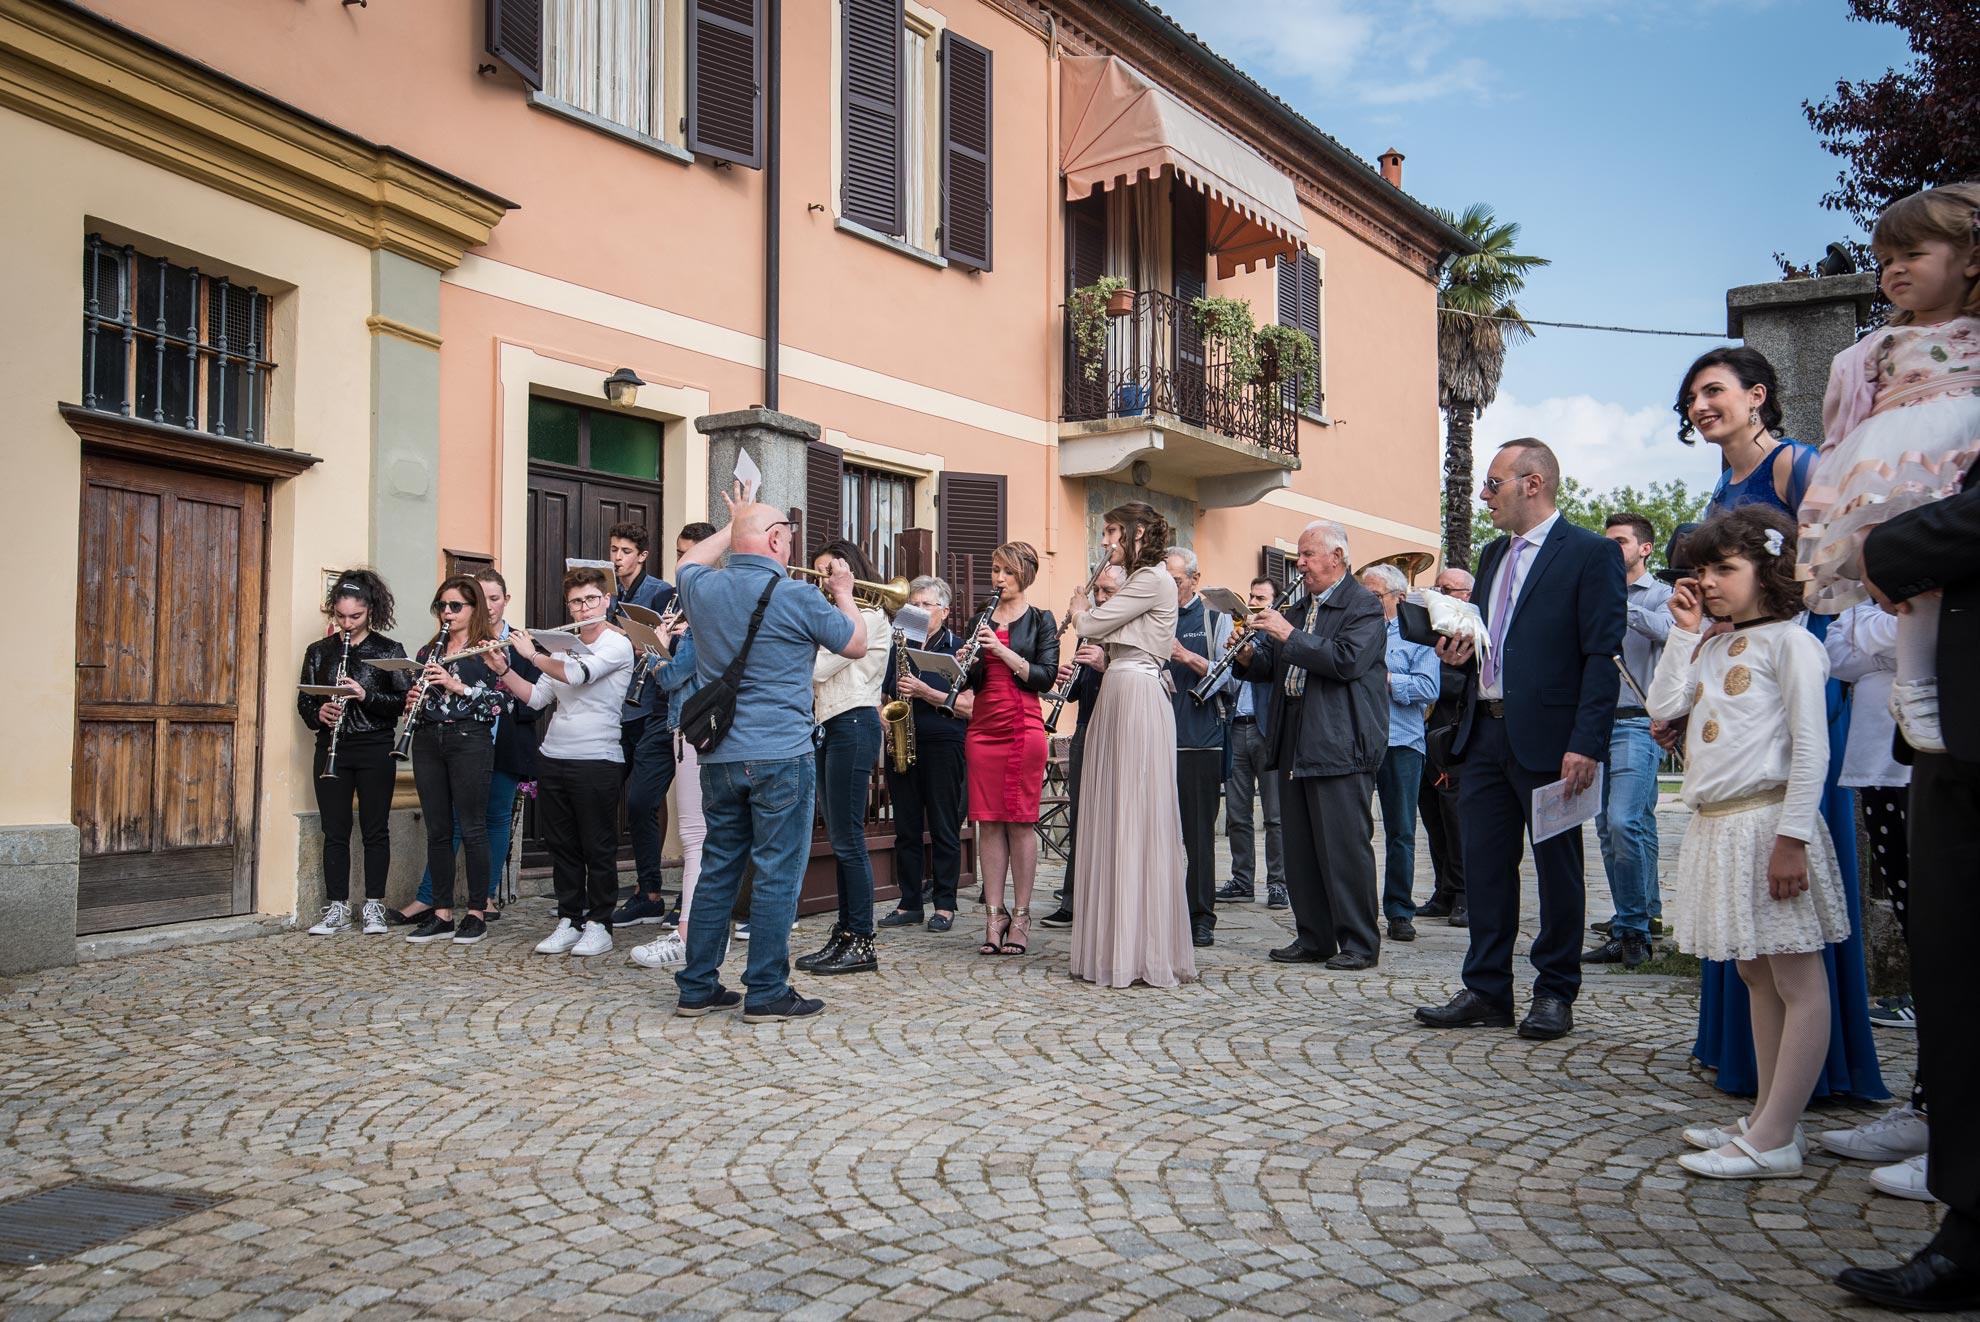 Matrimonio a Narzole Lorenza Diego - DSC 0605 - Fotografo matrimonio in Piemonte - Fotografo matrimonio in Piemonte